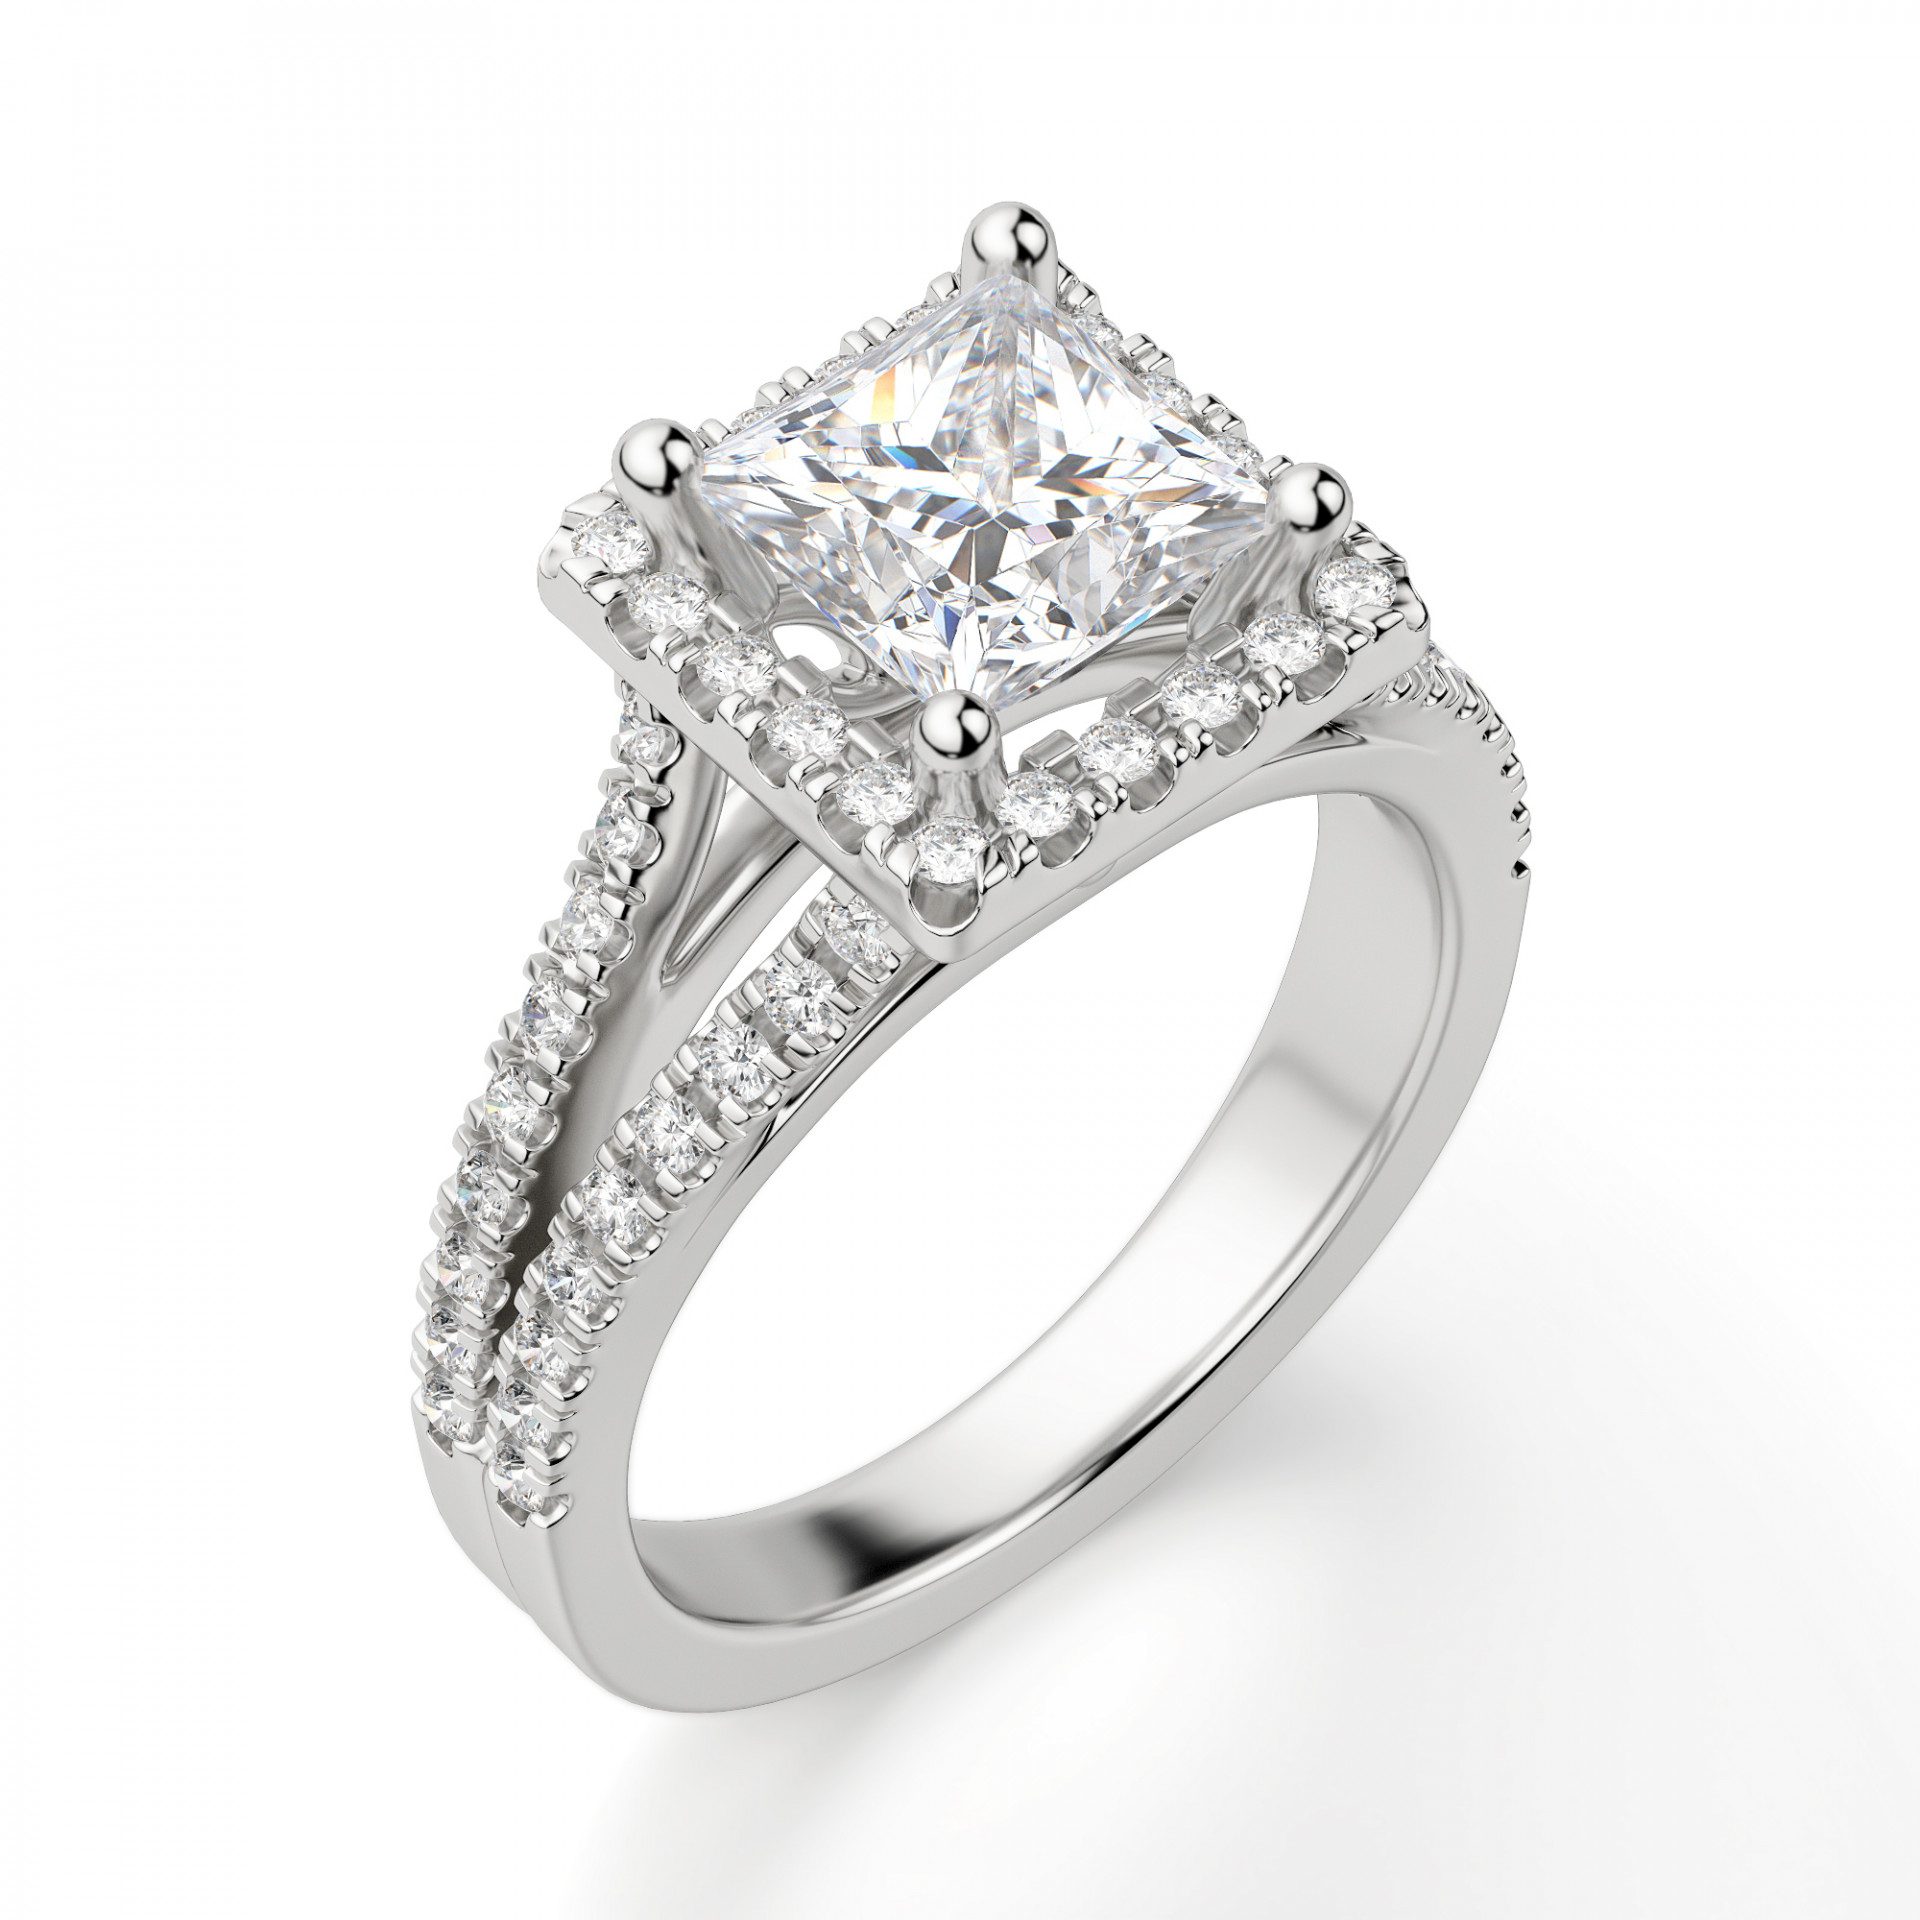 d8ddfc5a93c1a Palm Springs Princess Cut Engagement Ring